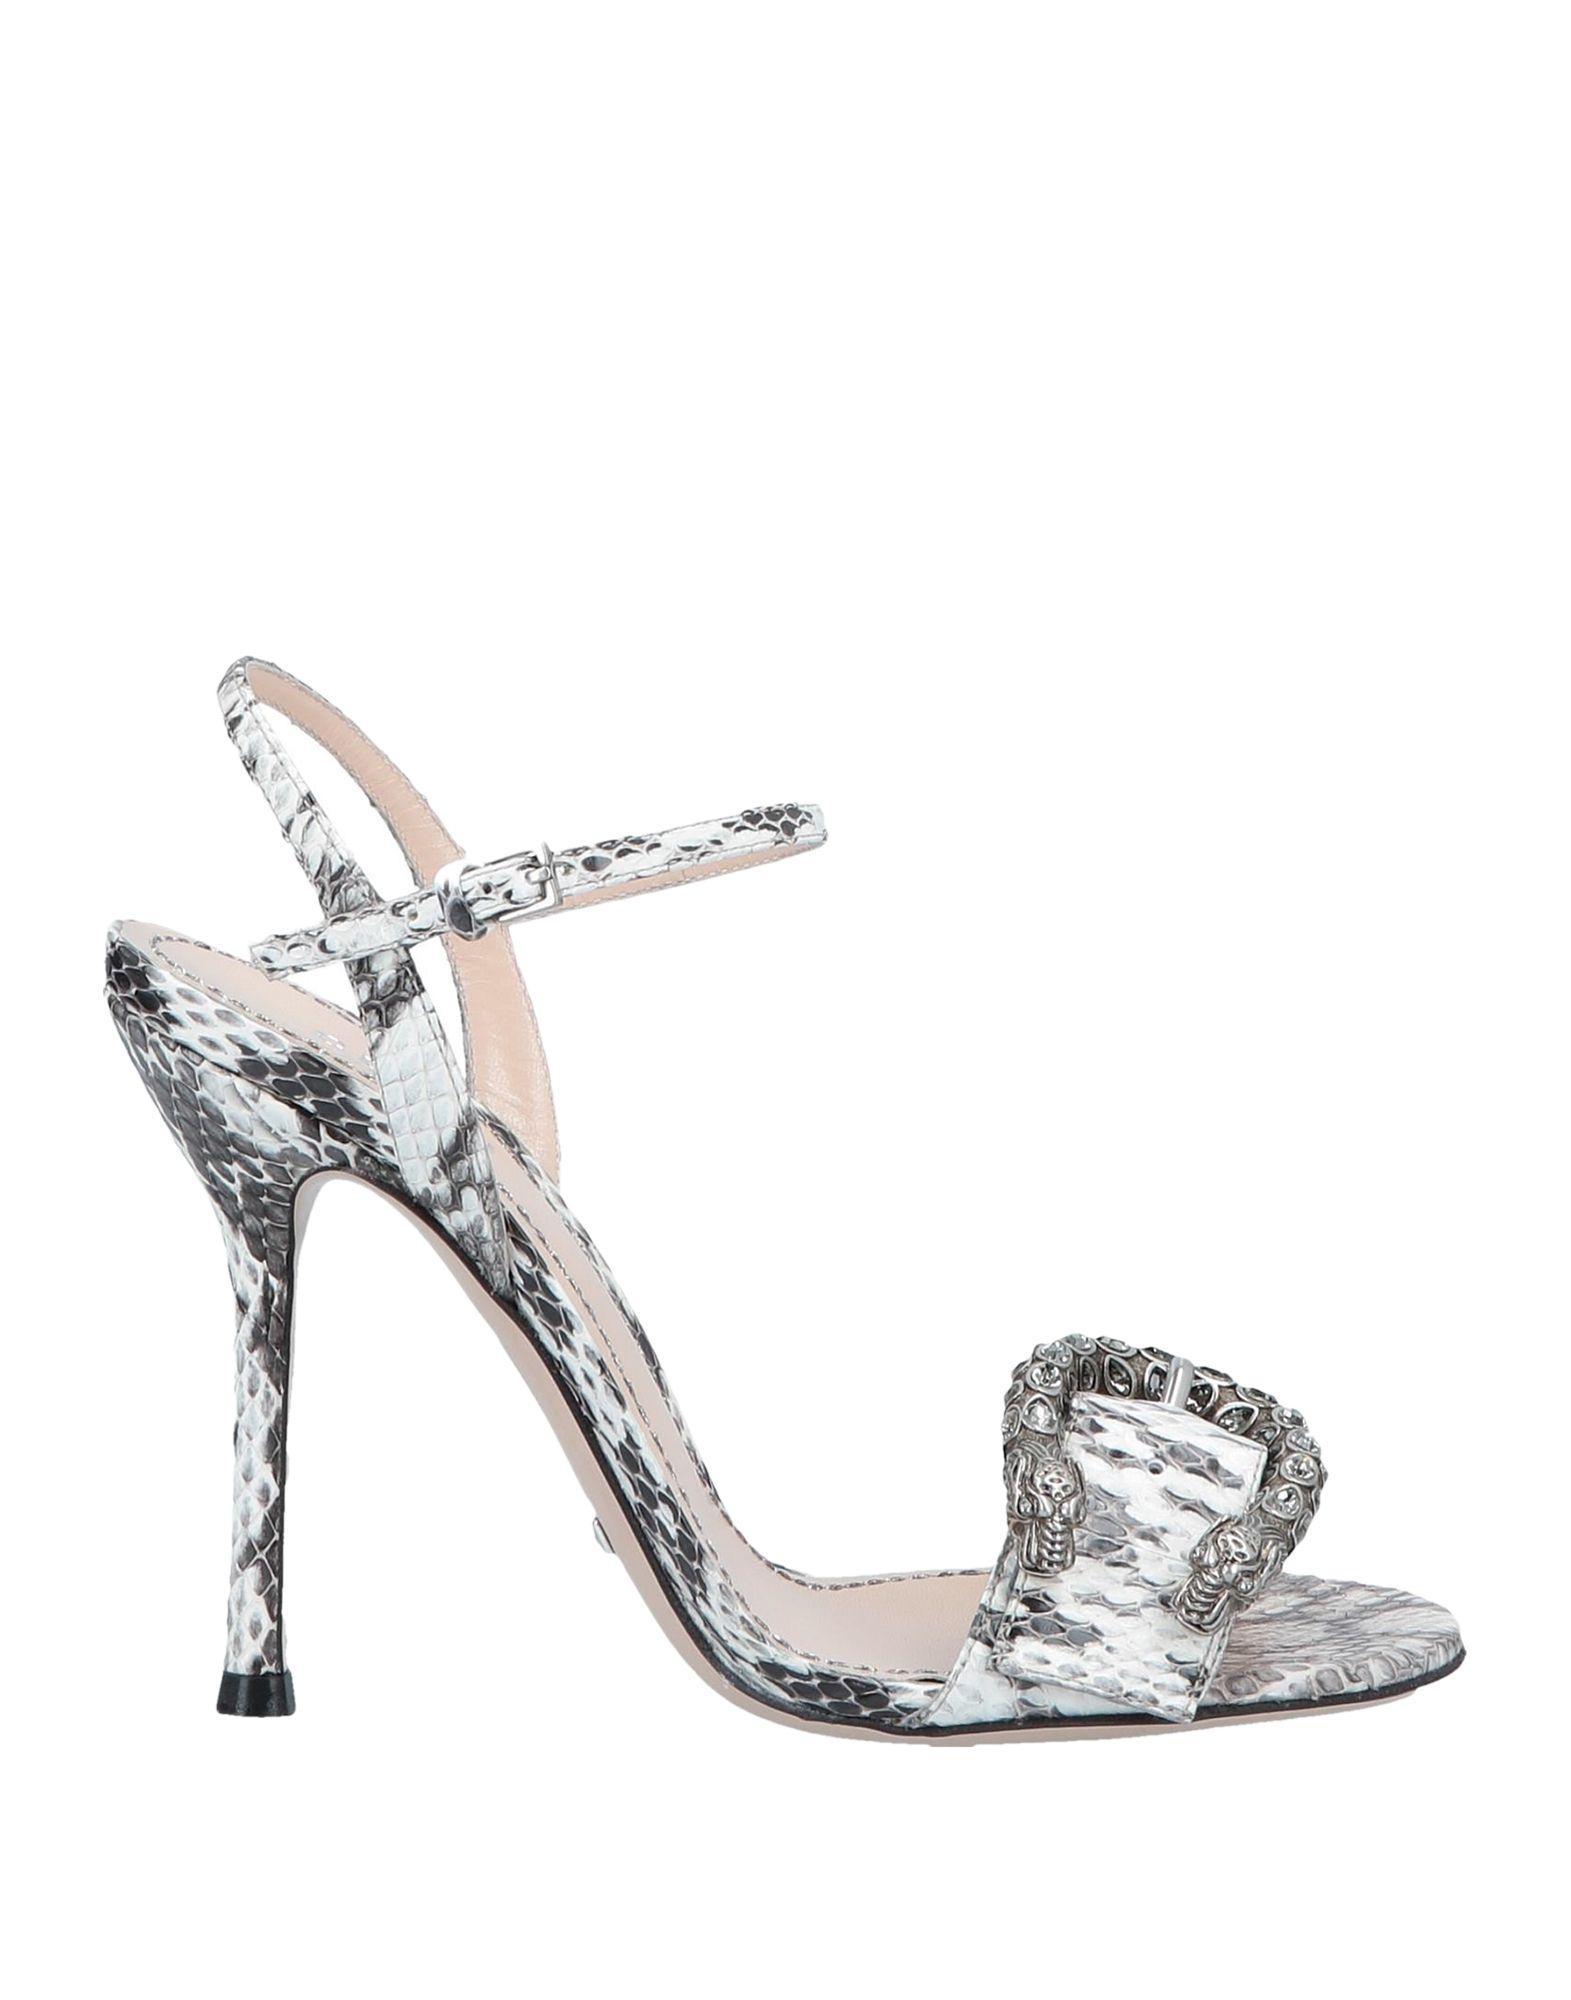 af370d44e28 Lyst - Gucci Sandals in White